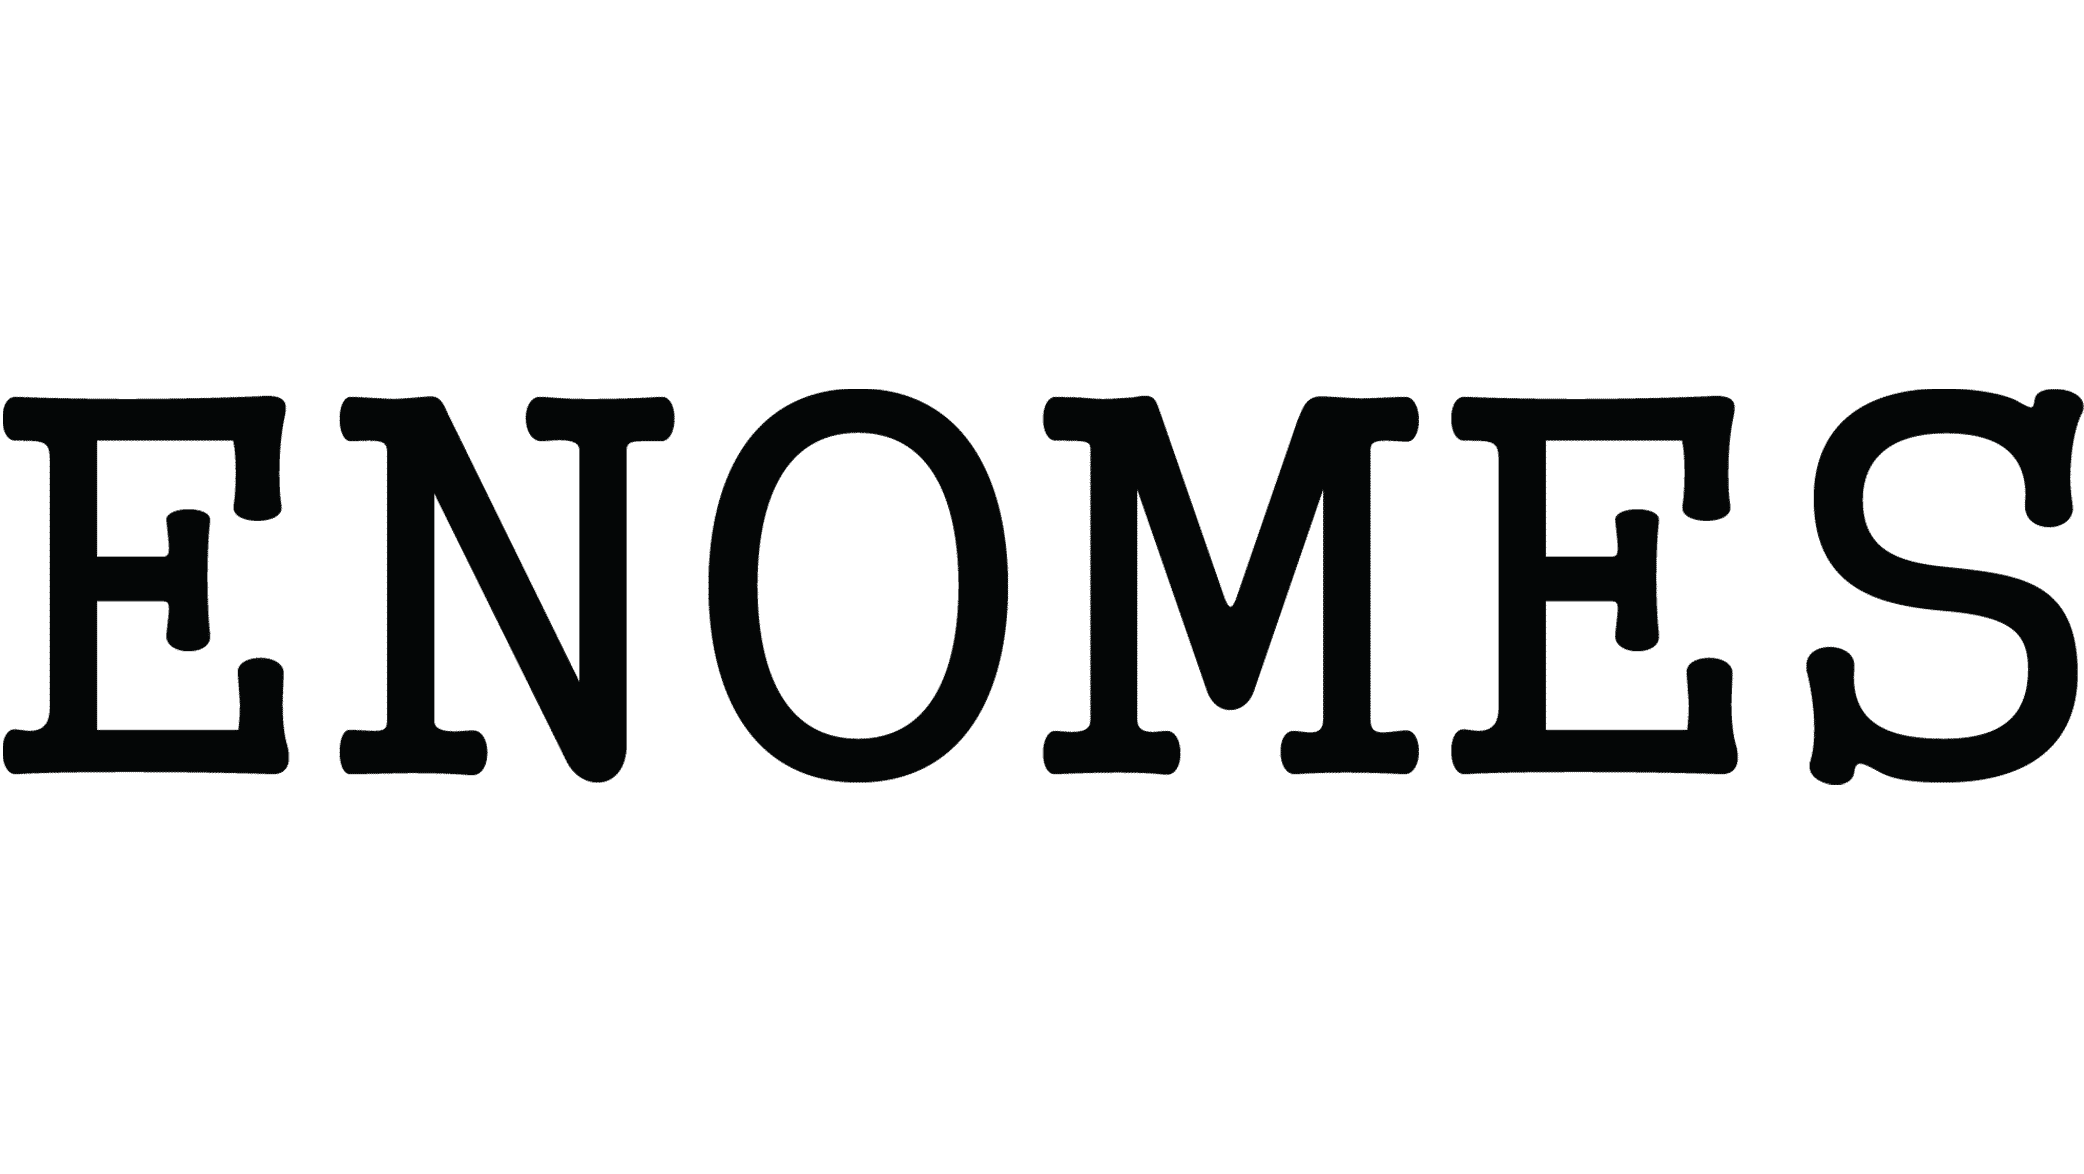 Enomes.co